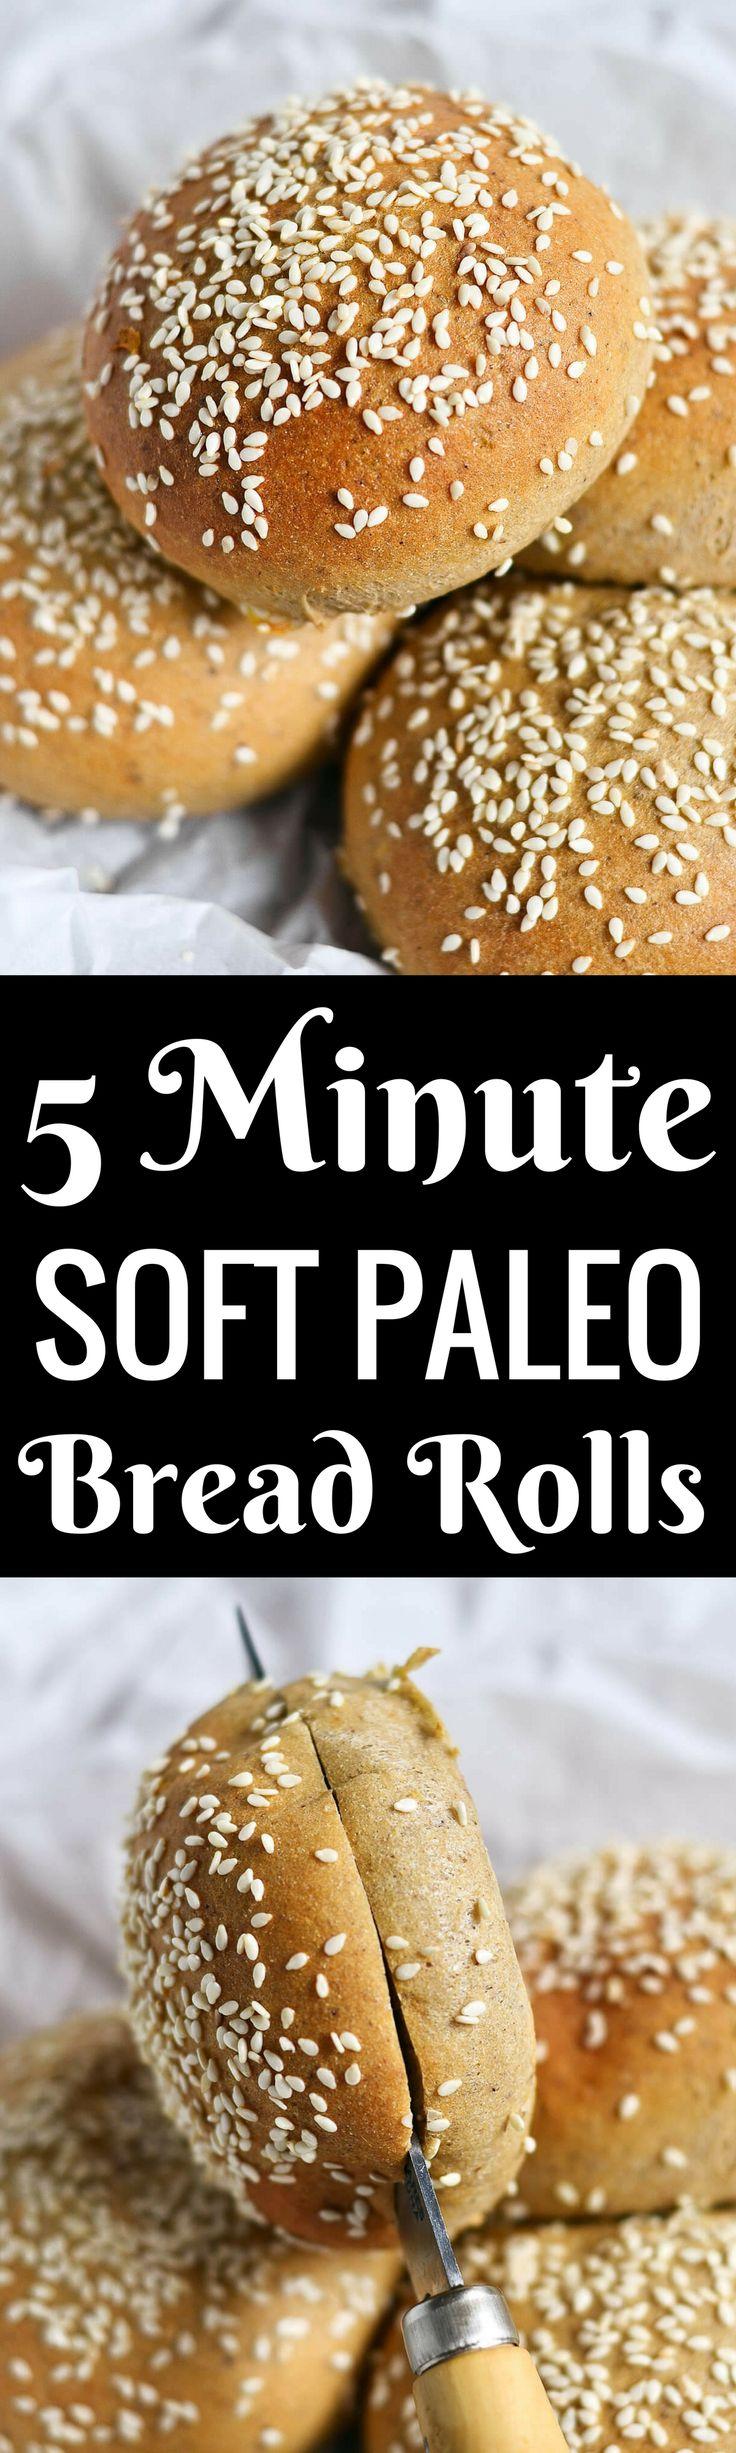 5 Minute Fluffy Flourless Soft Paleo Bread Rolls [Hamburger Buns]